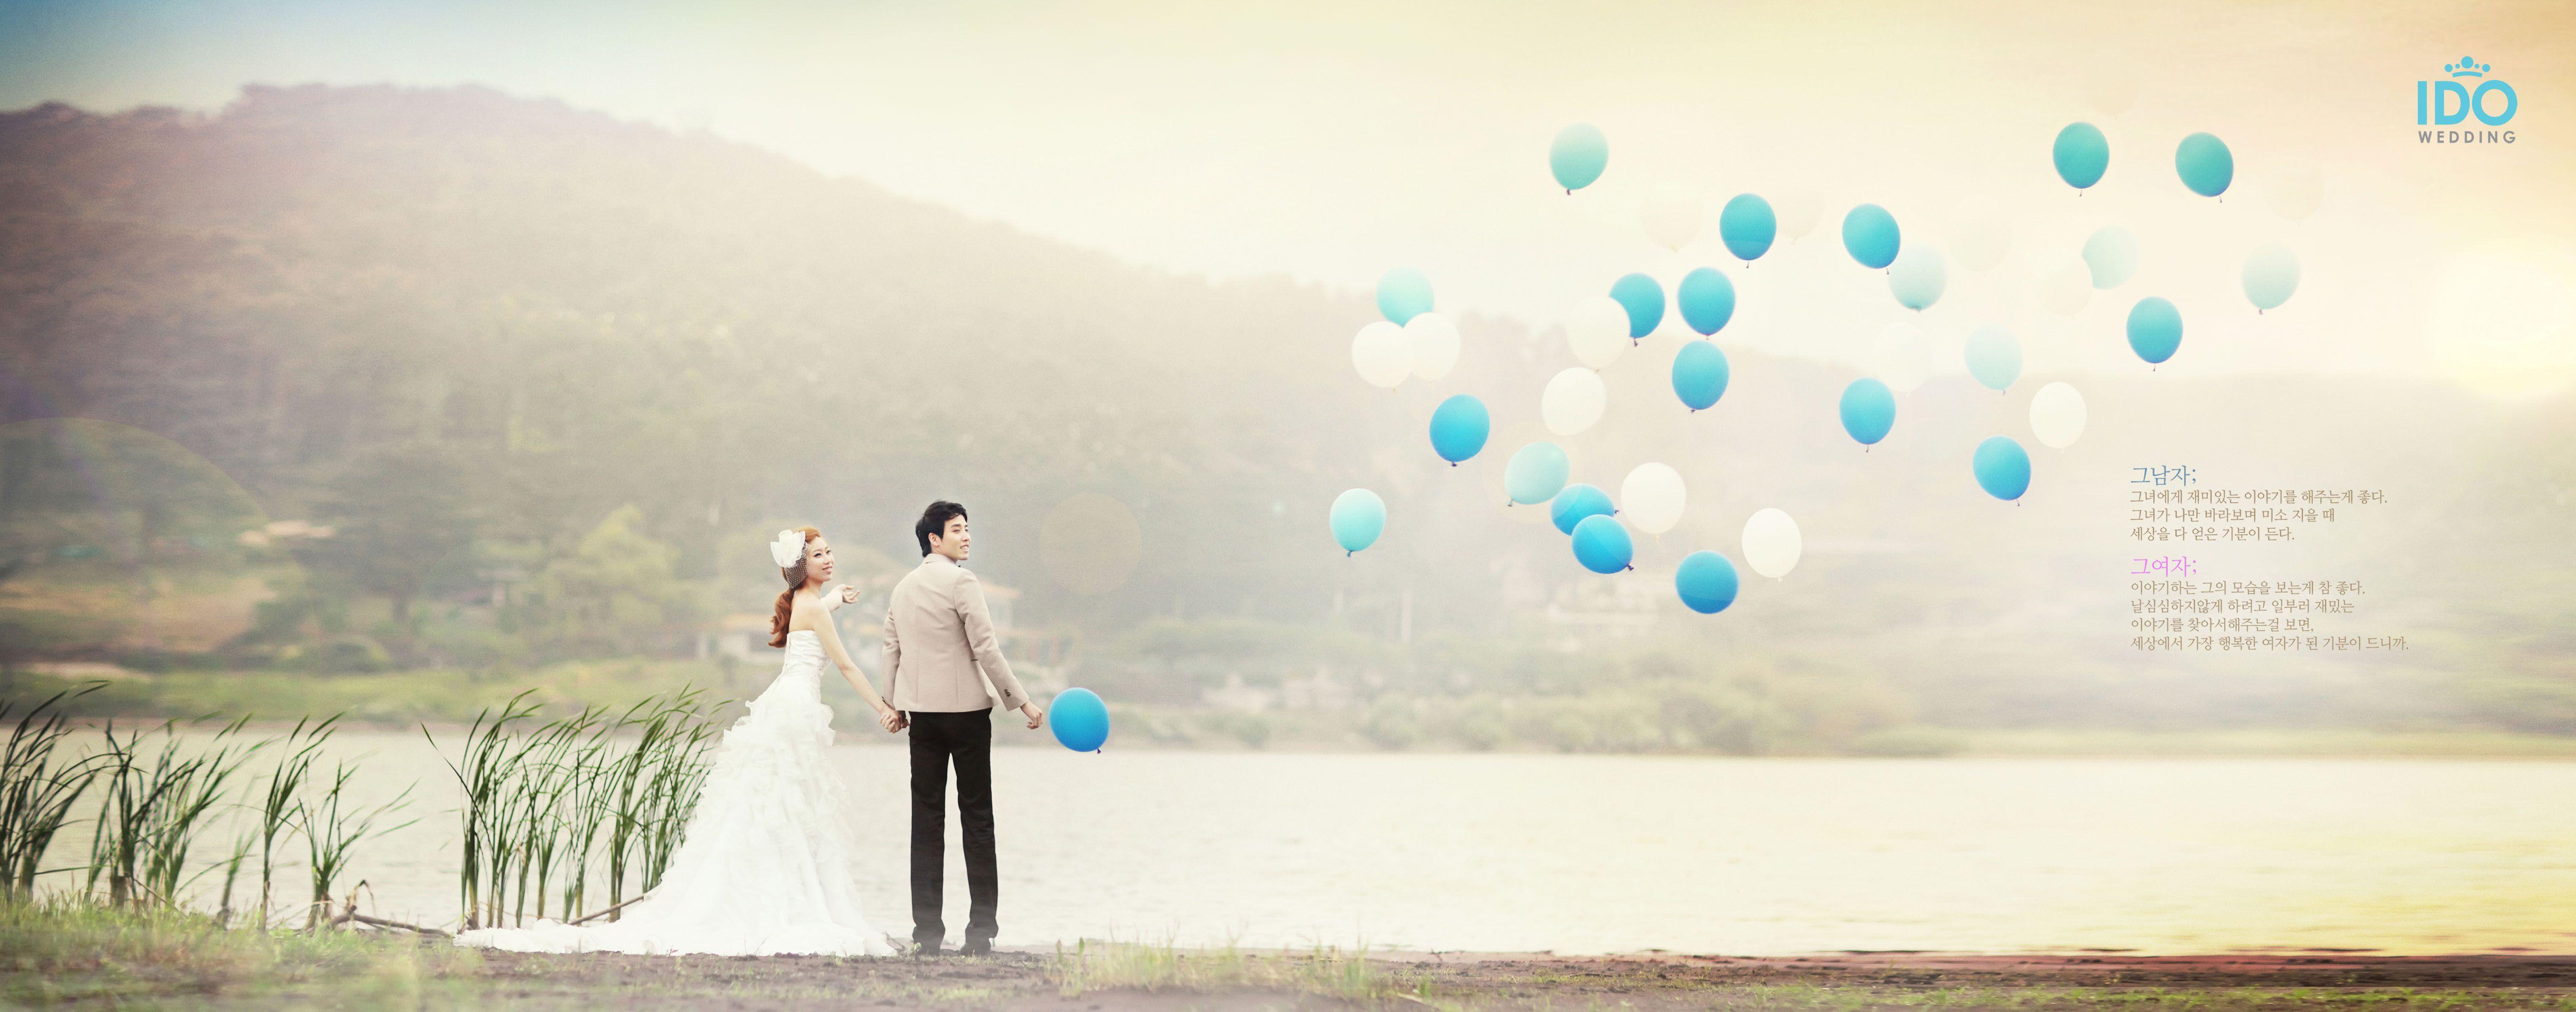 Korean concept wedding photography idowedding owedding